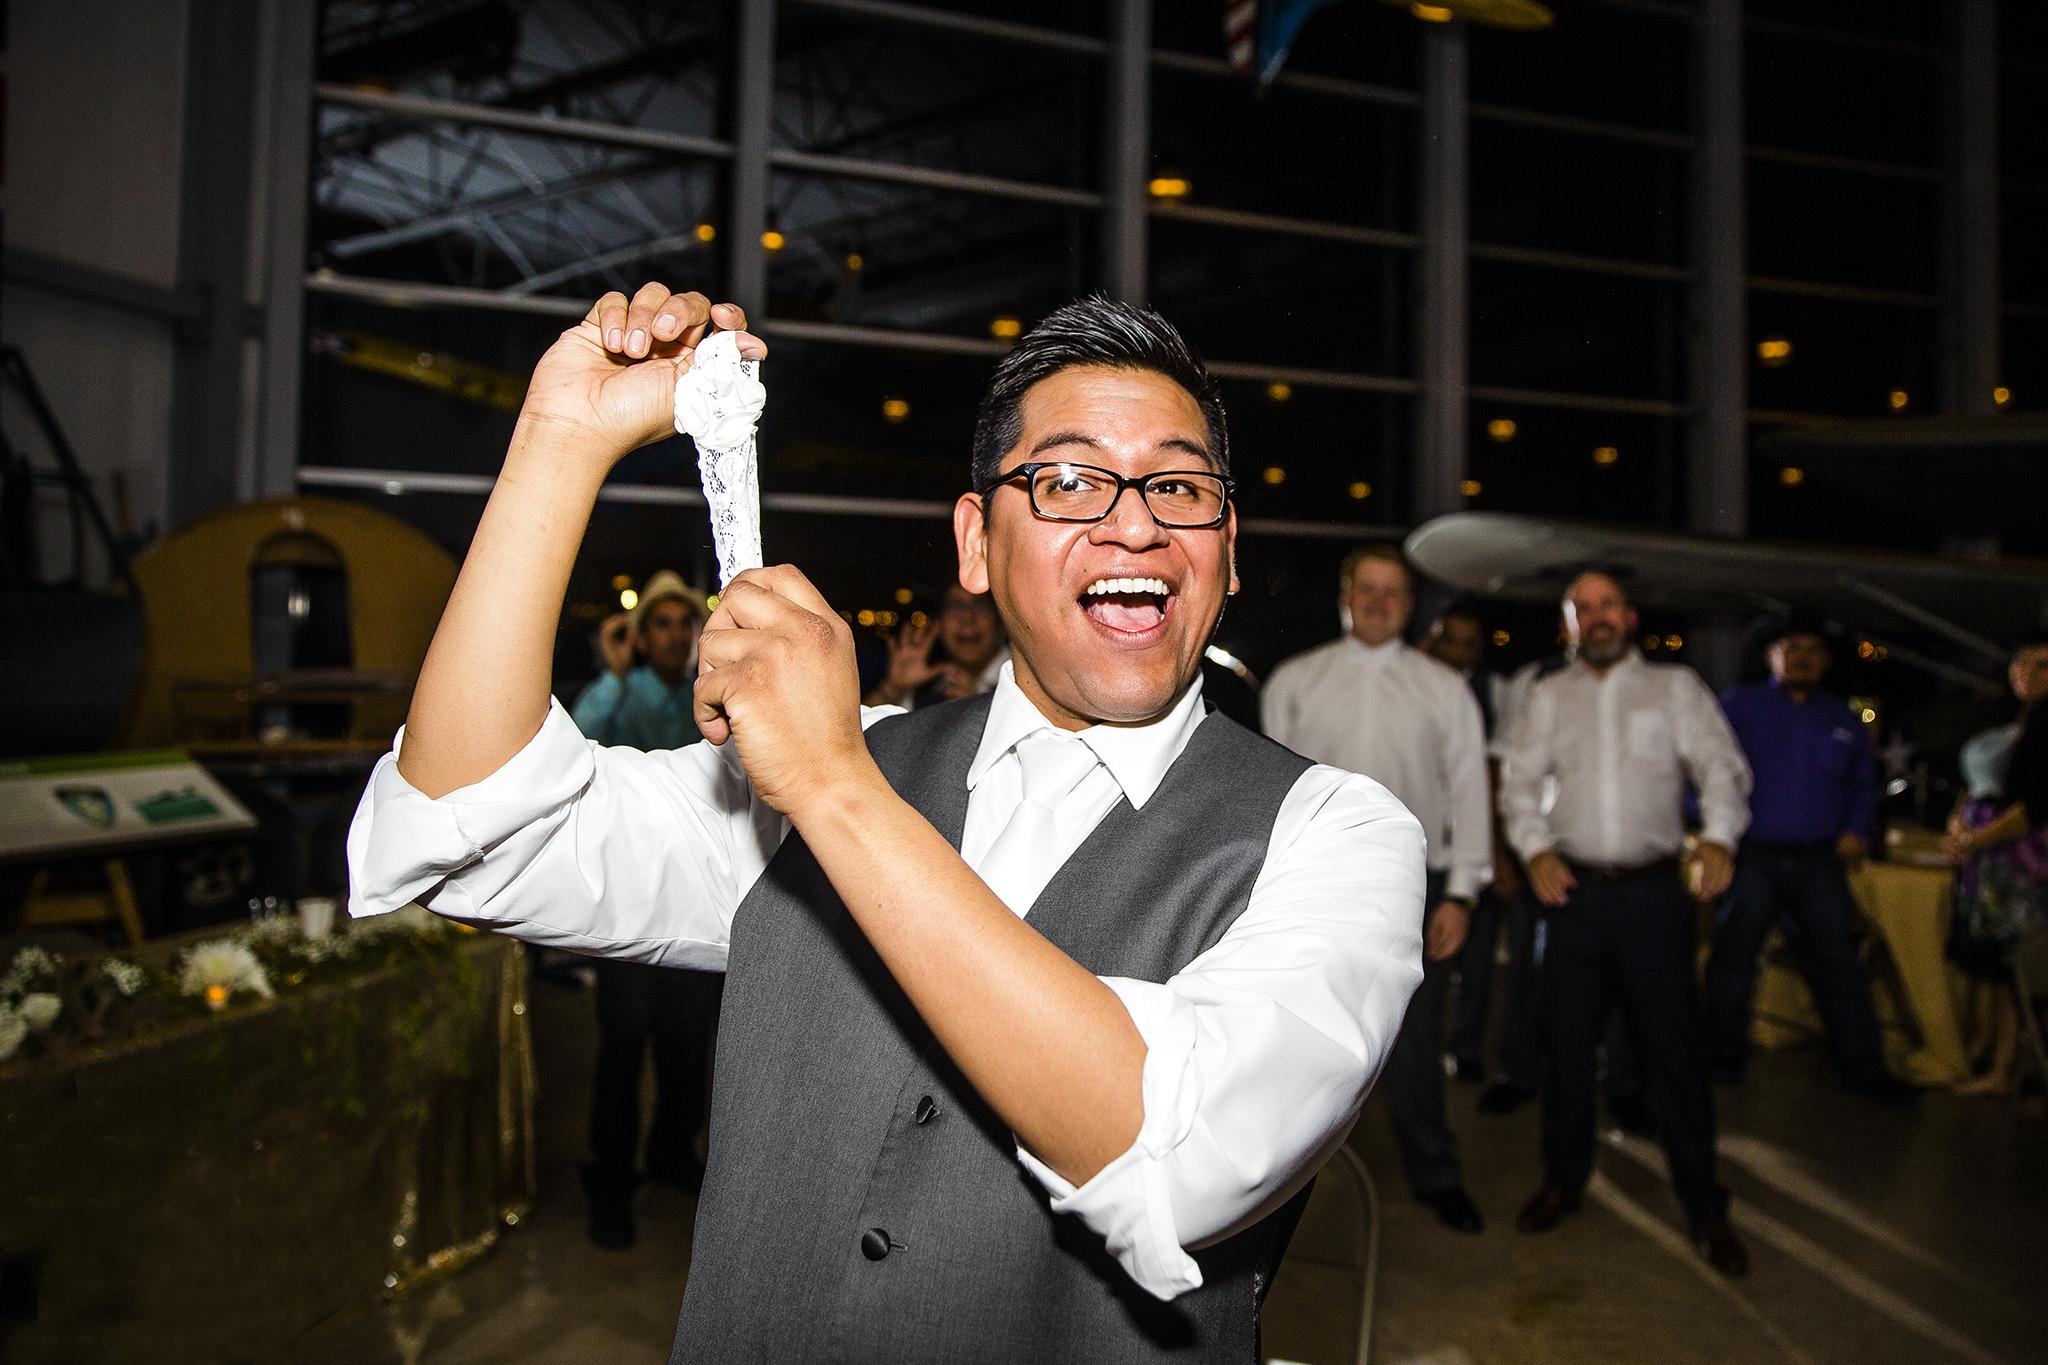 garter toss, groom, fun wedding reception, dramatic, edgy